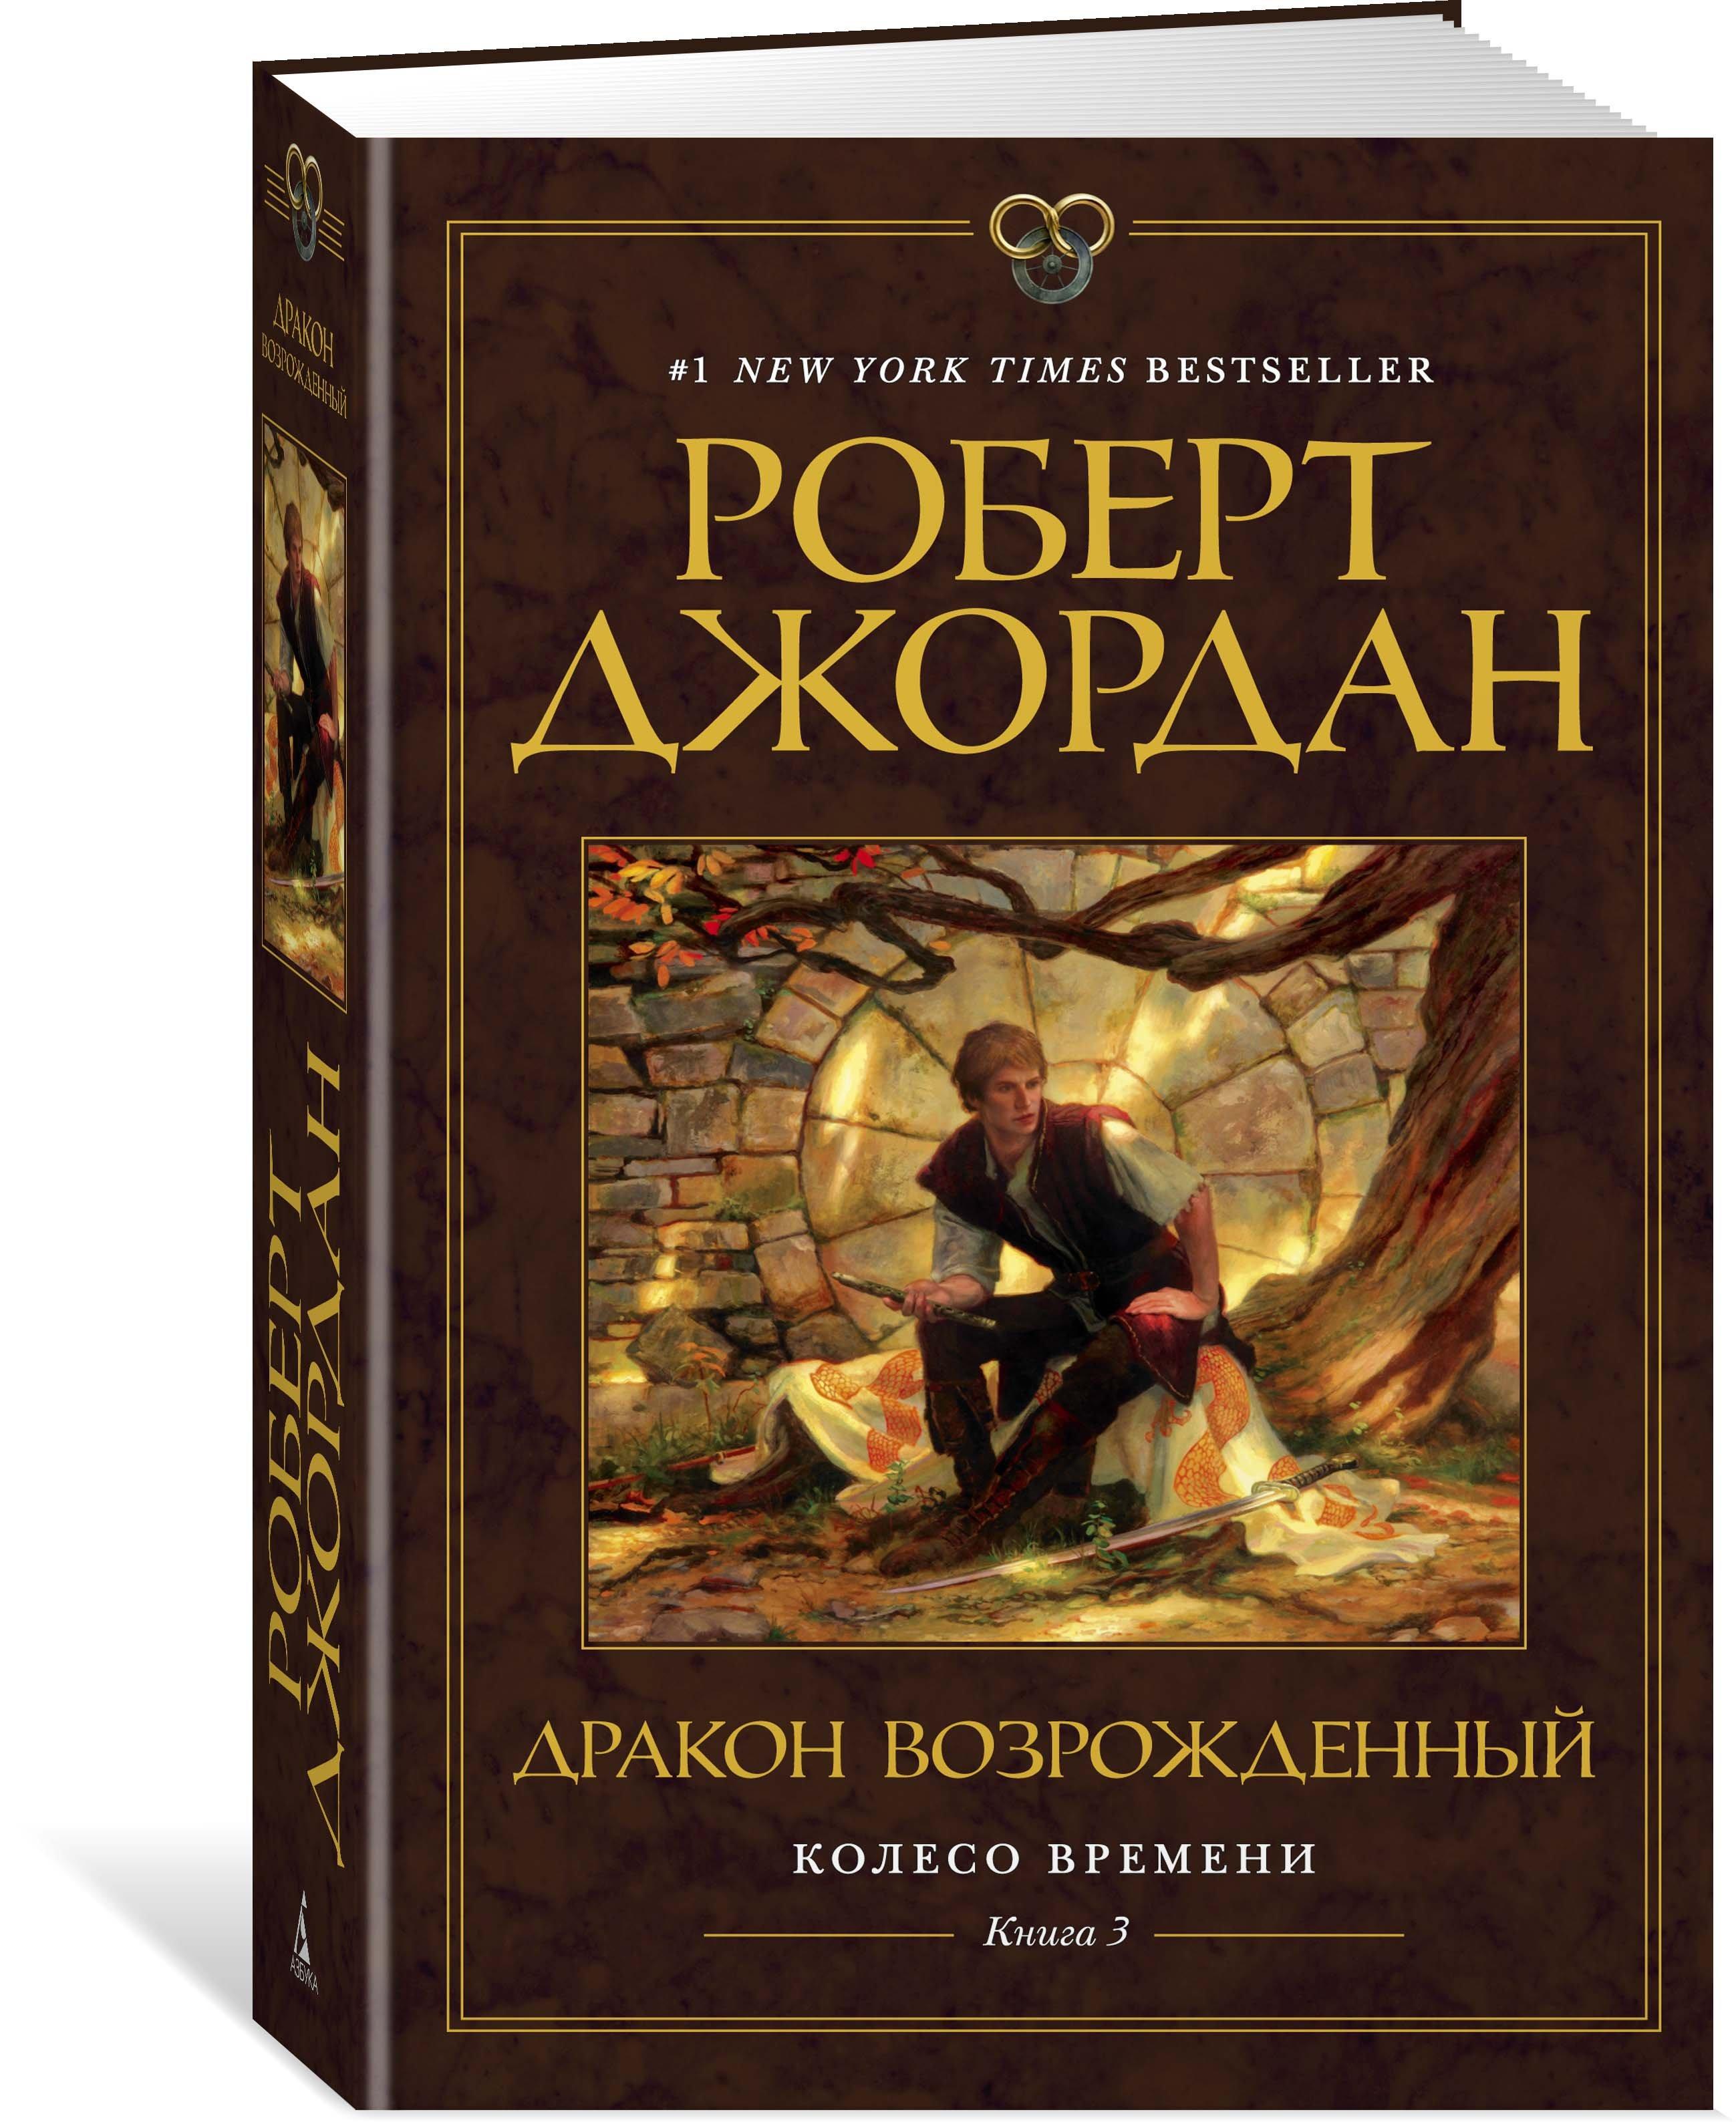 Джордан Роберт Колесо Времени. Книга 3. Дракон Возрожденный возрожденный дракон комплект из 2 книг